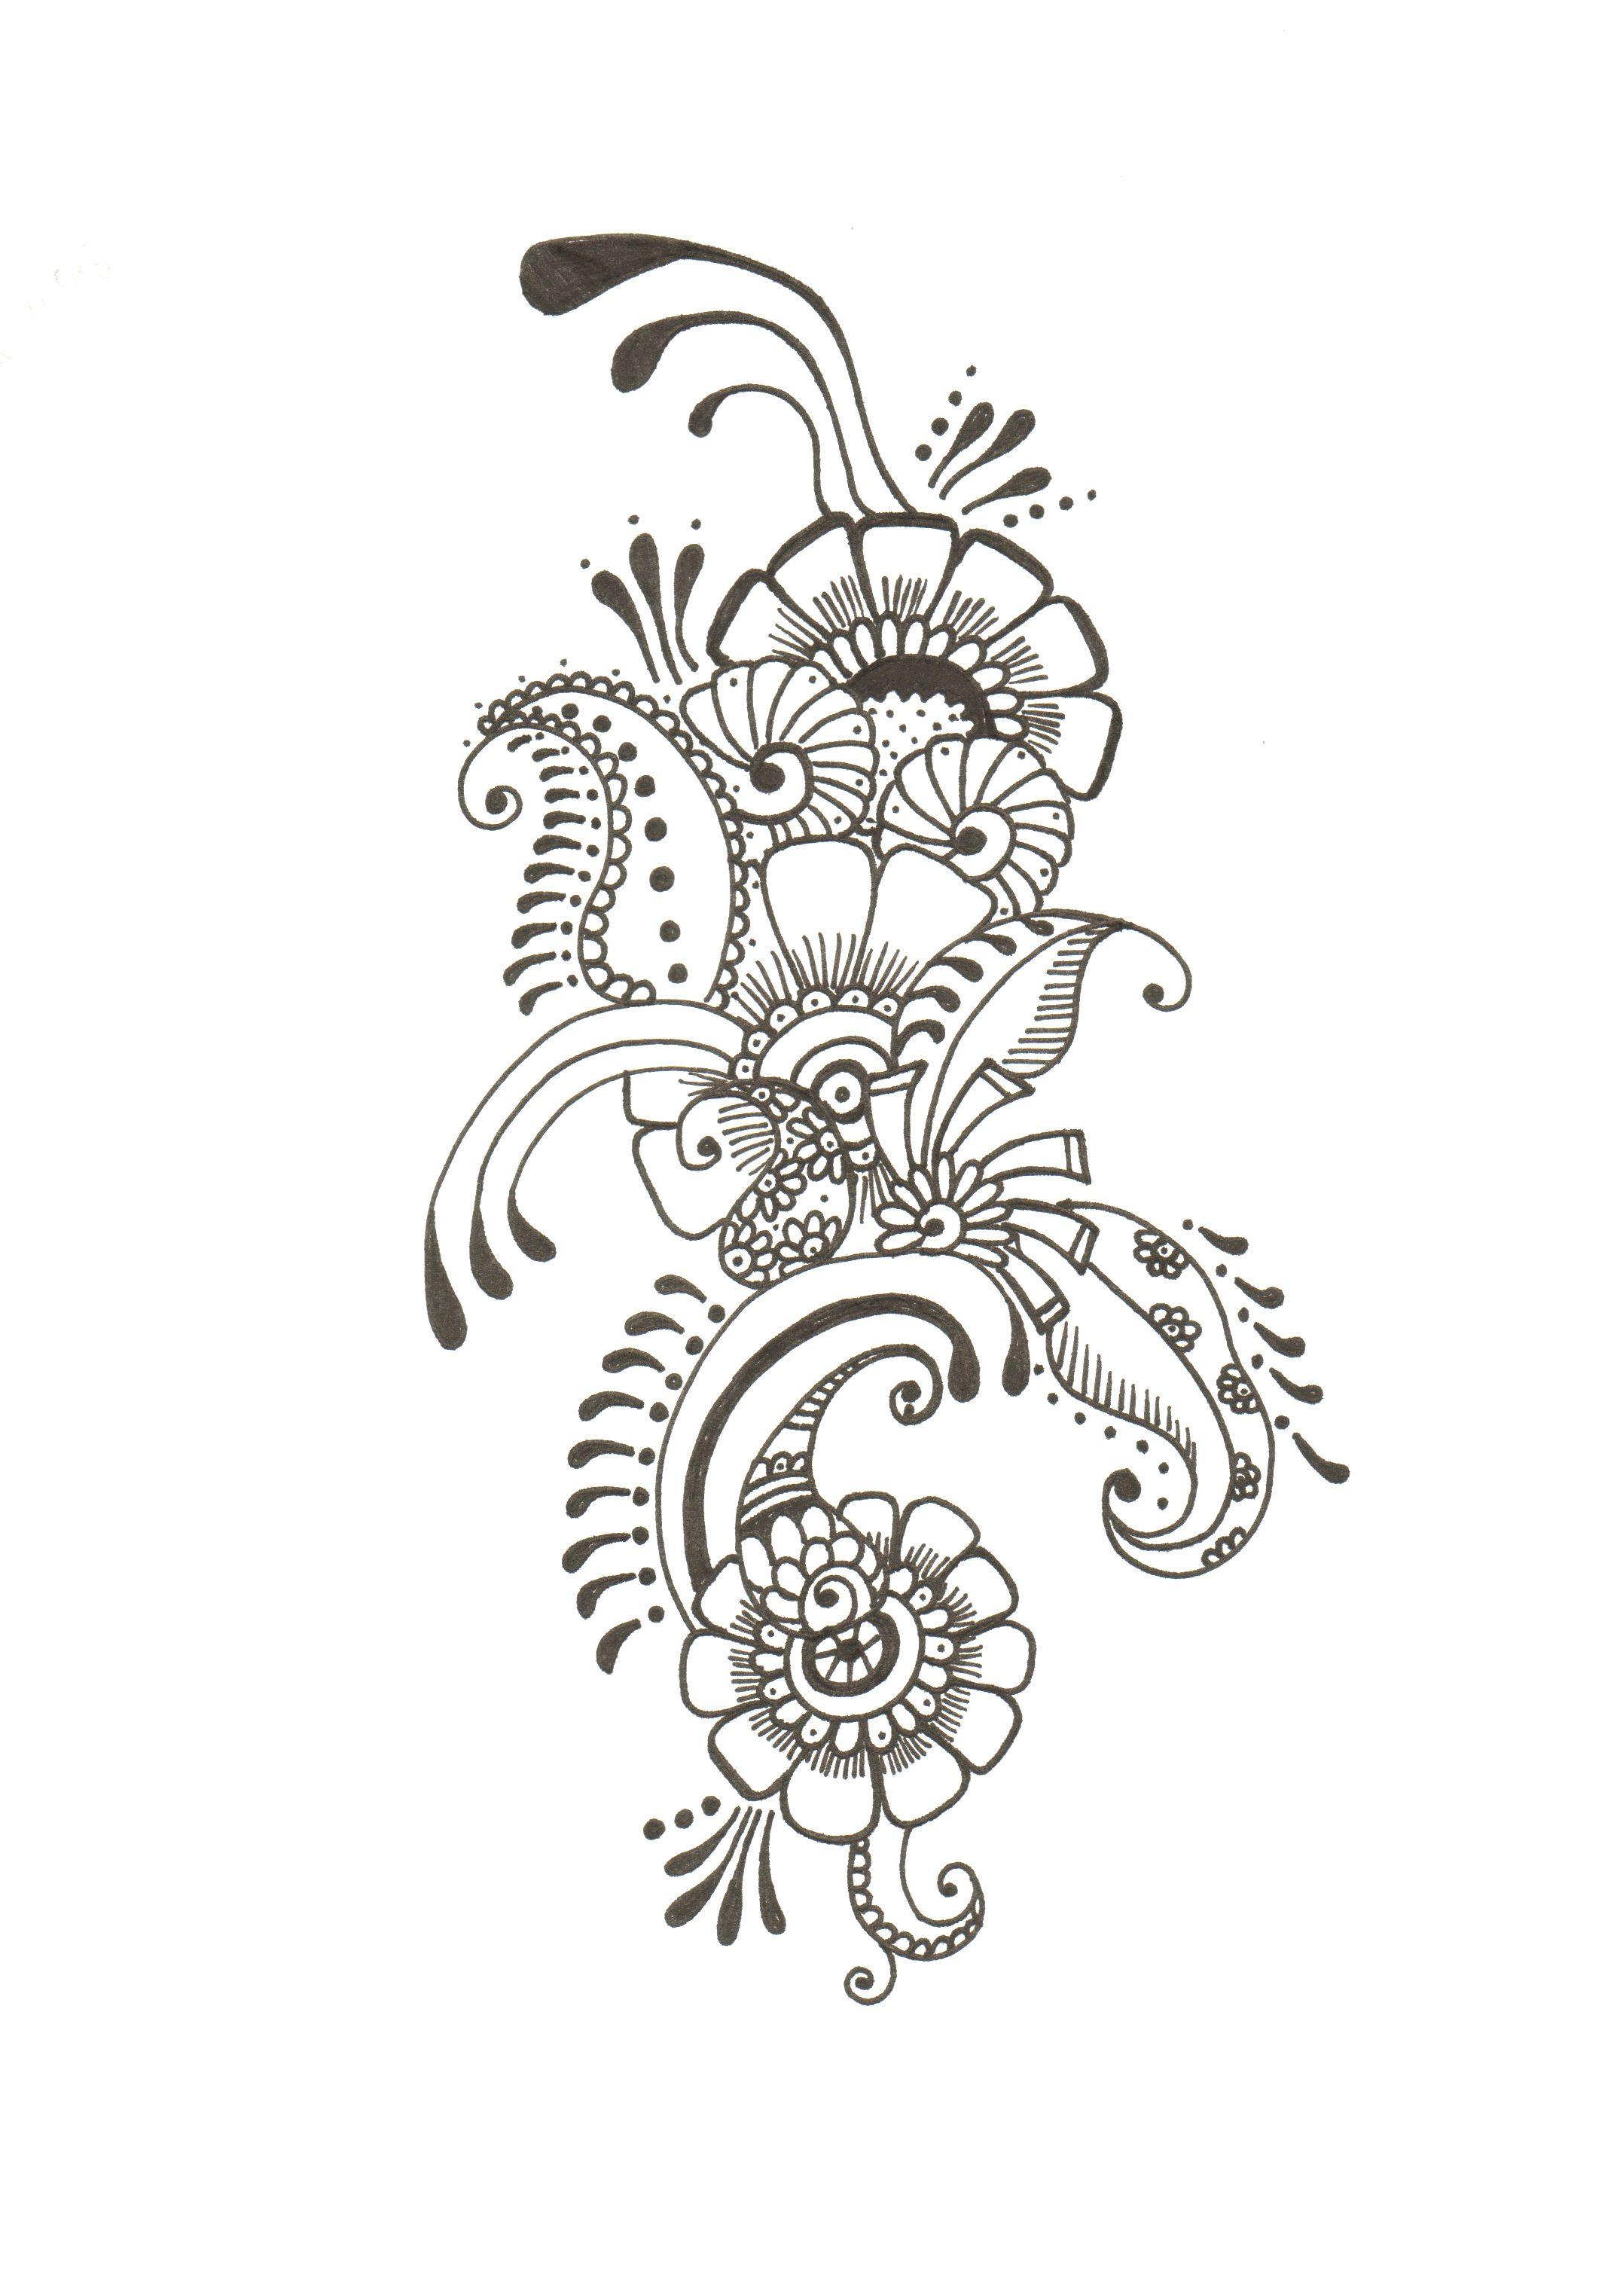 mds00011.jpg 2,151×3,048 pixels | Henna | Pinterest ...